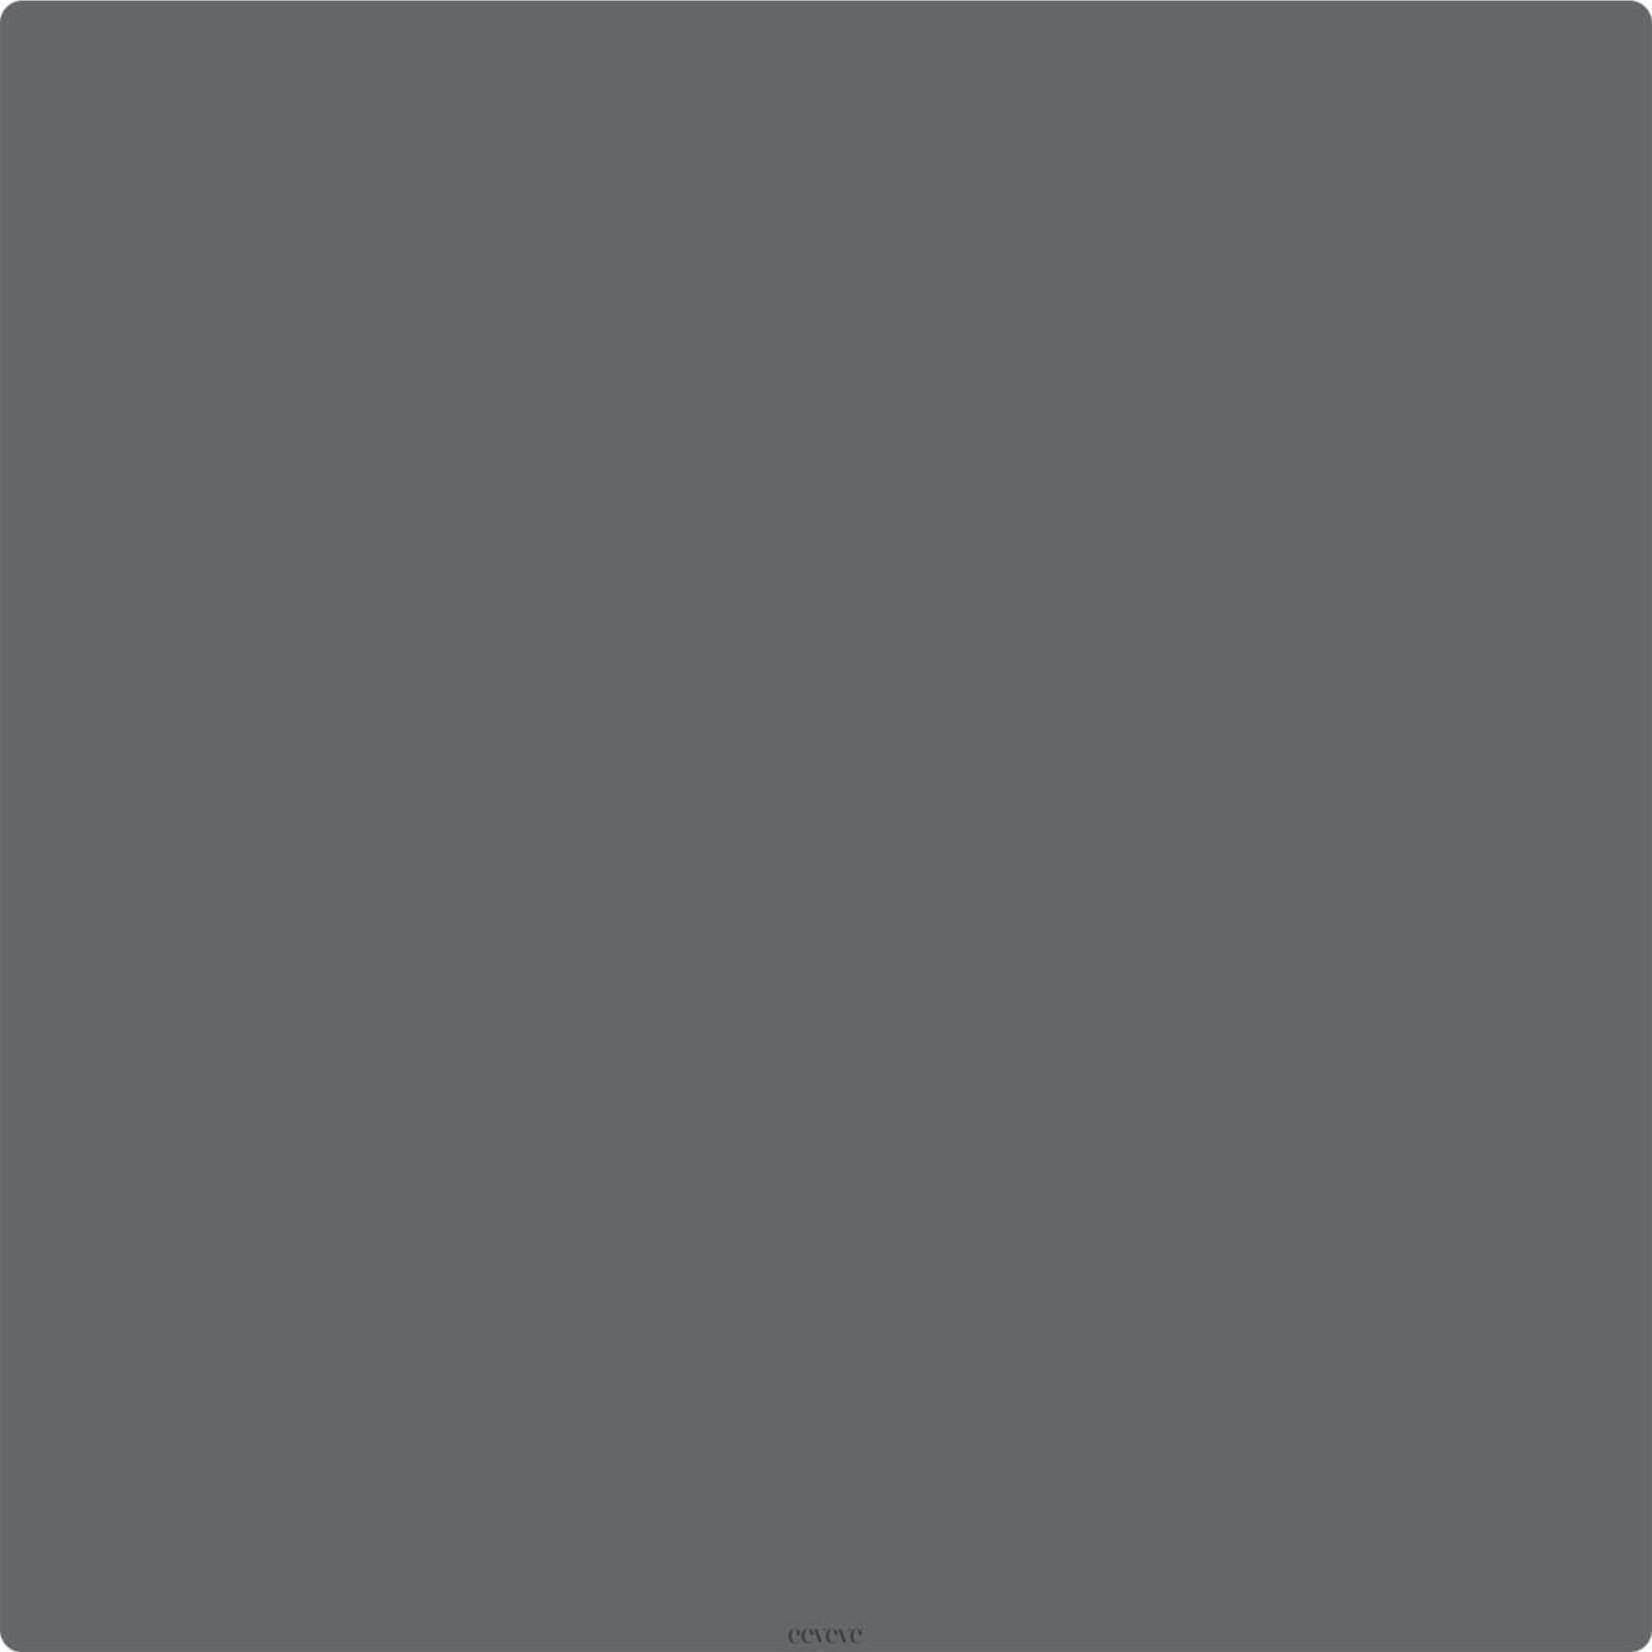 Eeveve Eeveve Square Splash Mat Granite - Gray